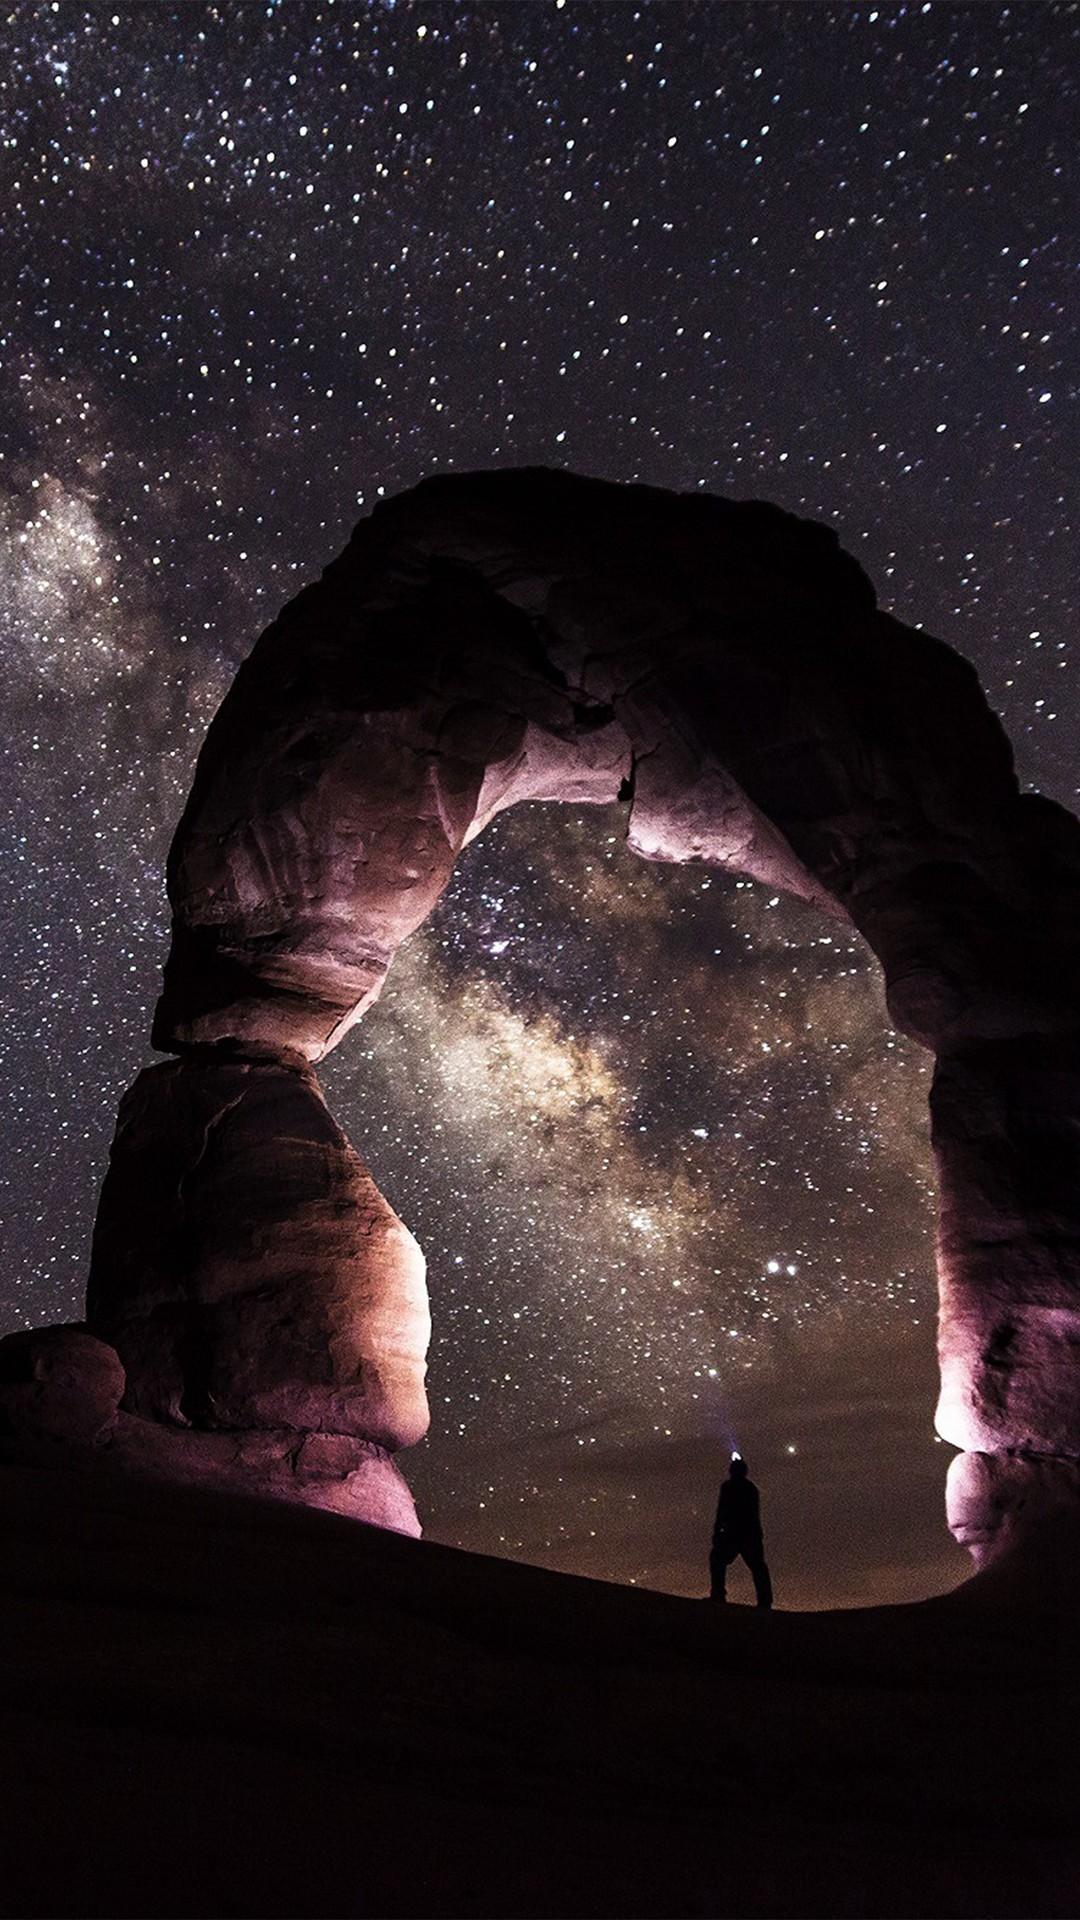 Beautiful Night Sky Wallpaper (66+ images)